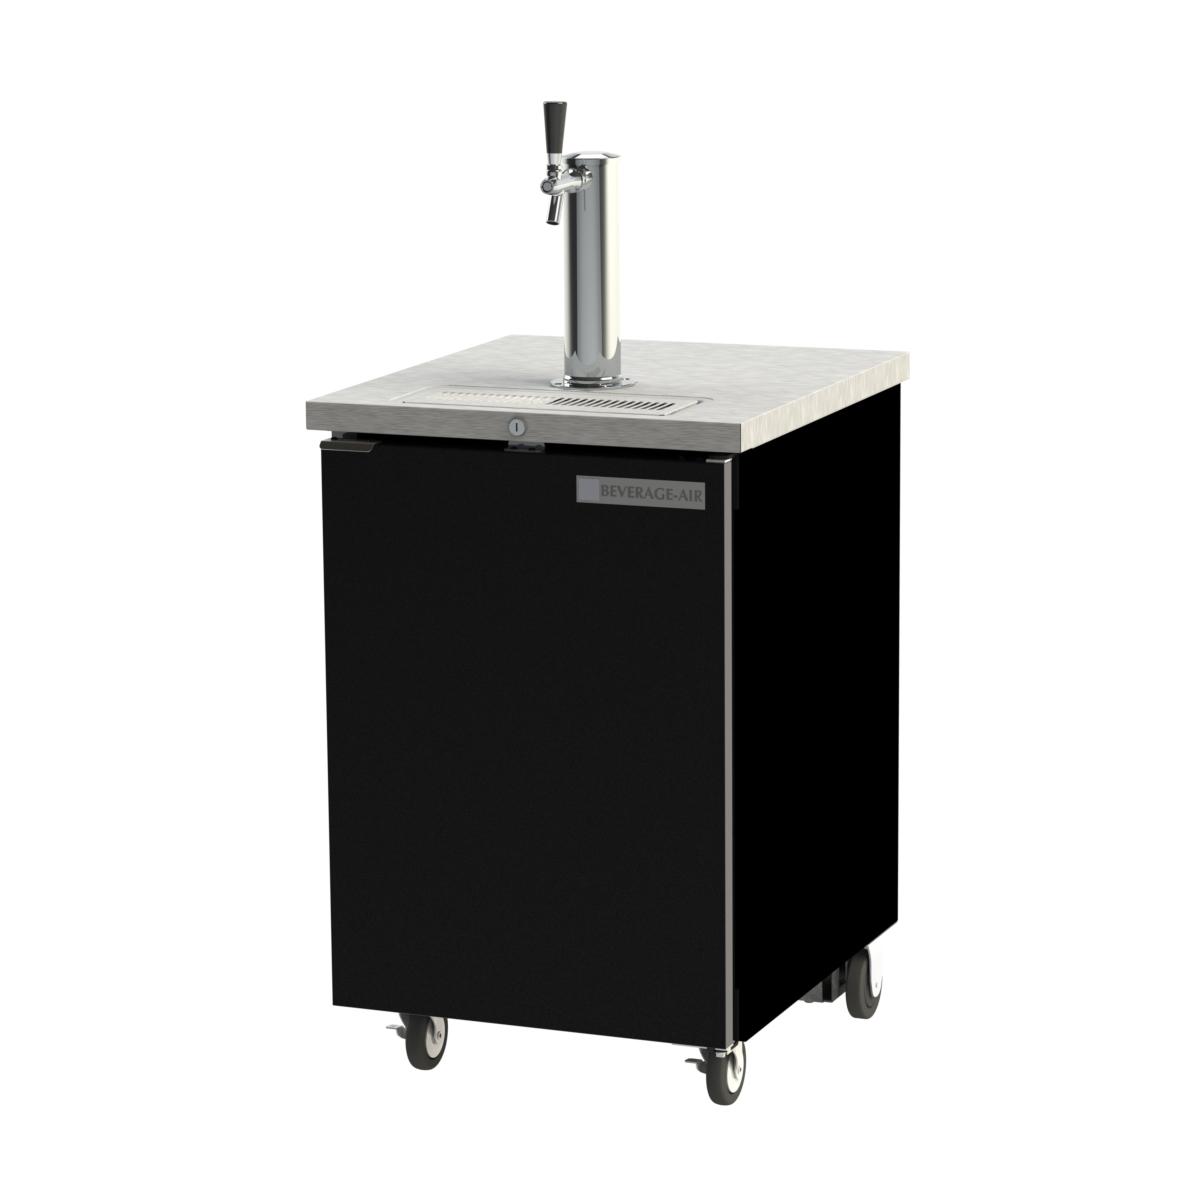 DD24HC-1-B Beverage Air draft beer cooler